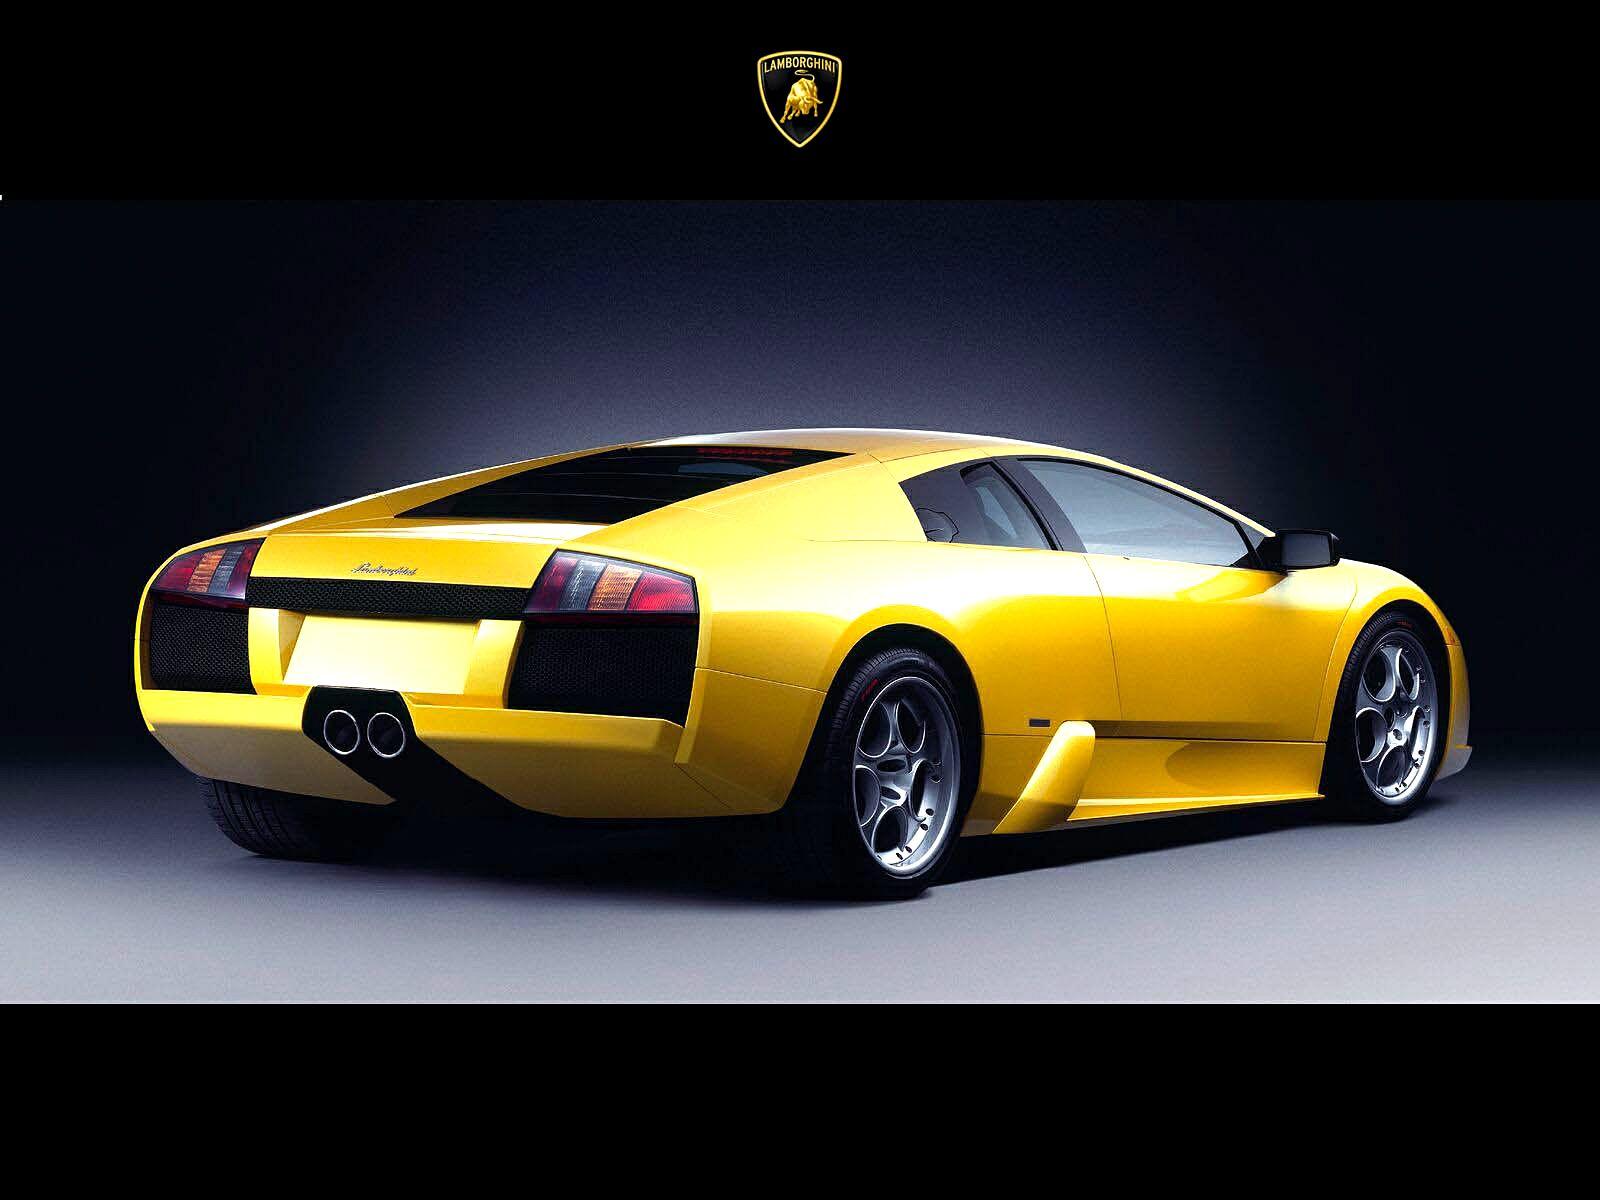 2013 jeep wrangler html with Lamborghini Murcielago Wallpaper 3 on Toyota Hilux 6x6 For Sale further Lamborghini Murcielago Wallpaper 3 in addition Ios7 Ipad Wallpapers 2 likewise Lamborghini New 2017 2018 together with Ram 1500 Truck Xd Series Xd831 Chopstix 22x12 Wheels Rims 3662.